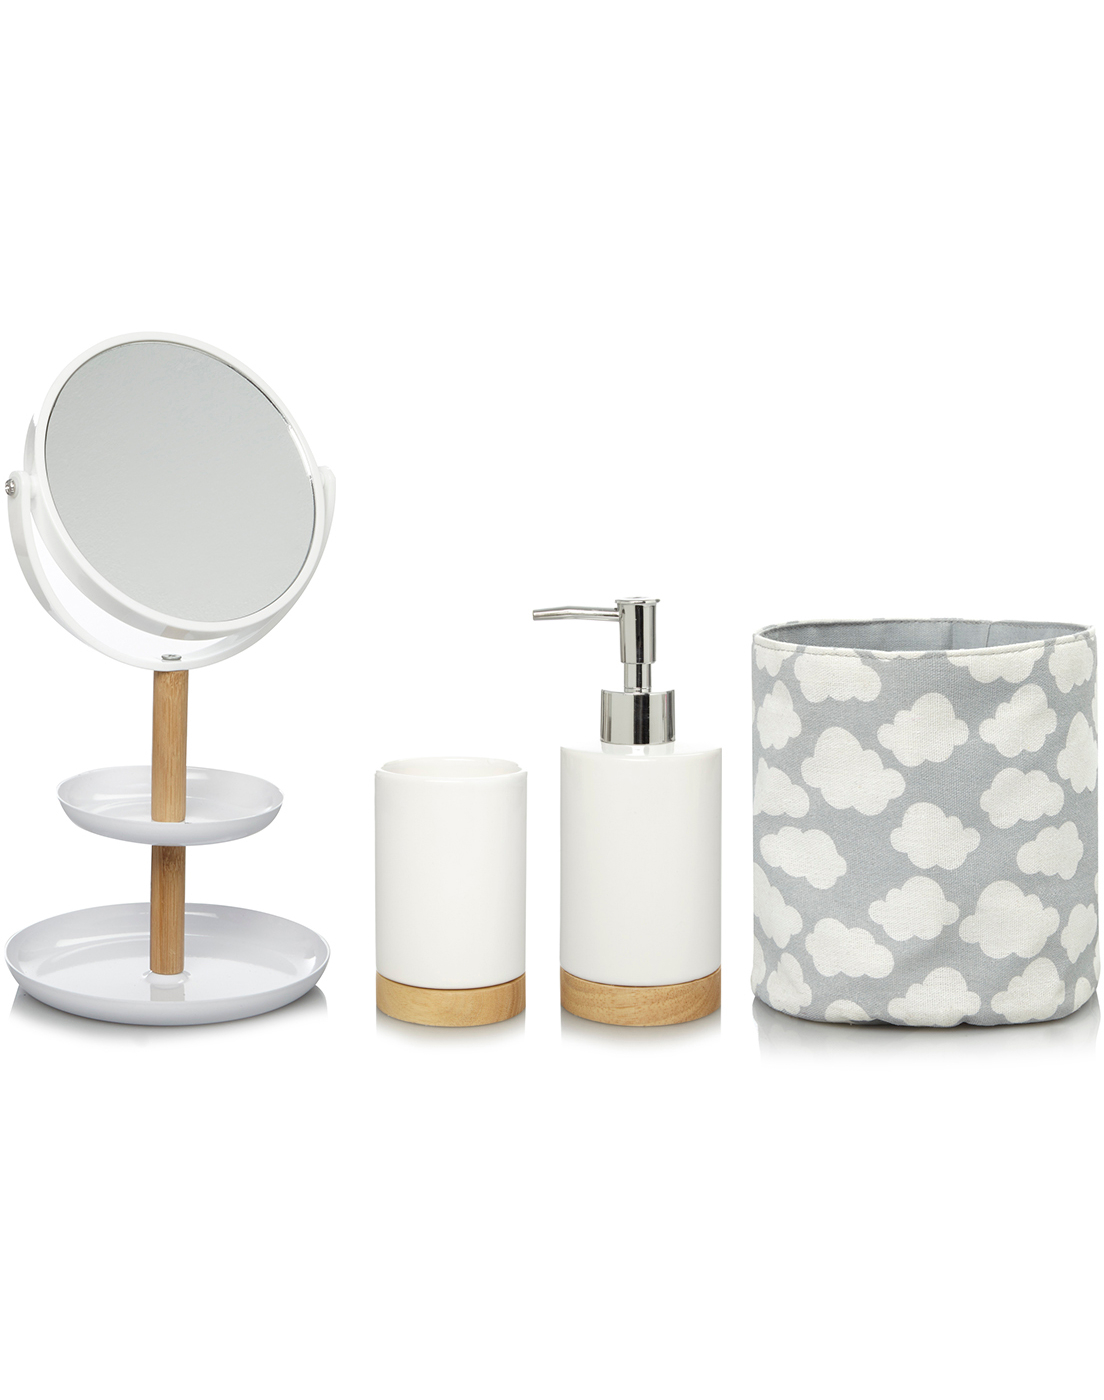 Bathroom Ornaments bathroom accessories | home & garden | george at asda